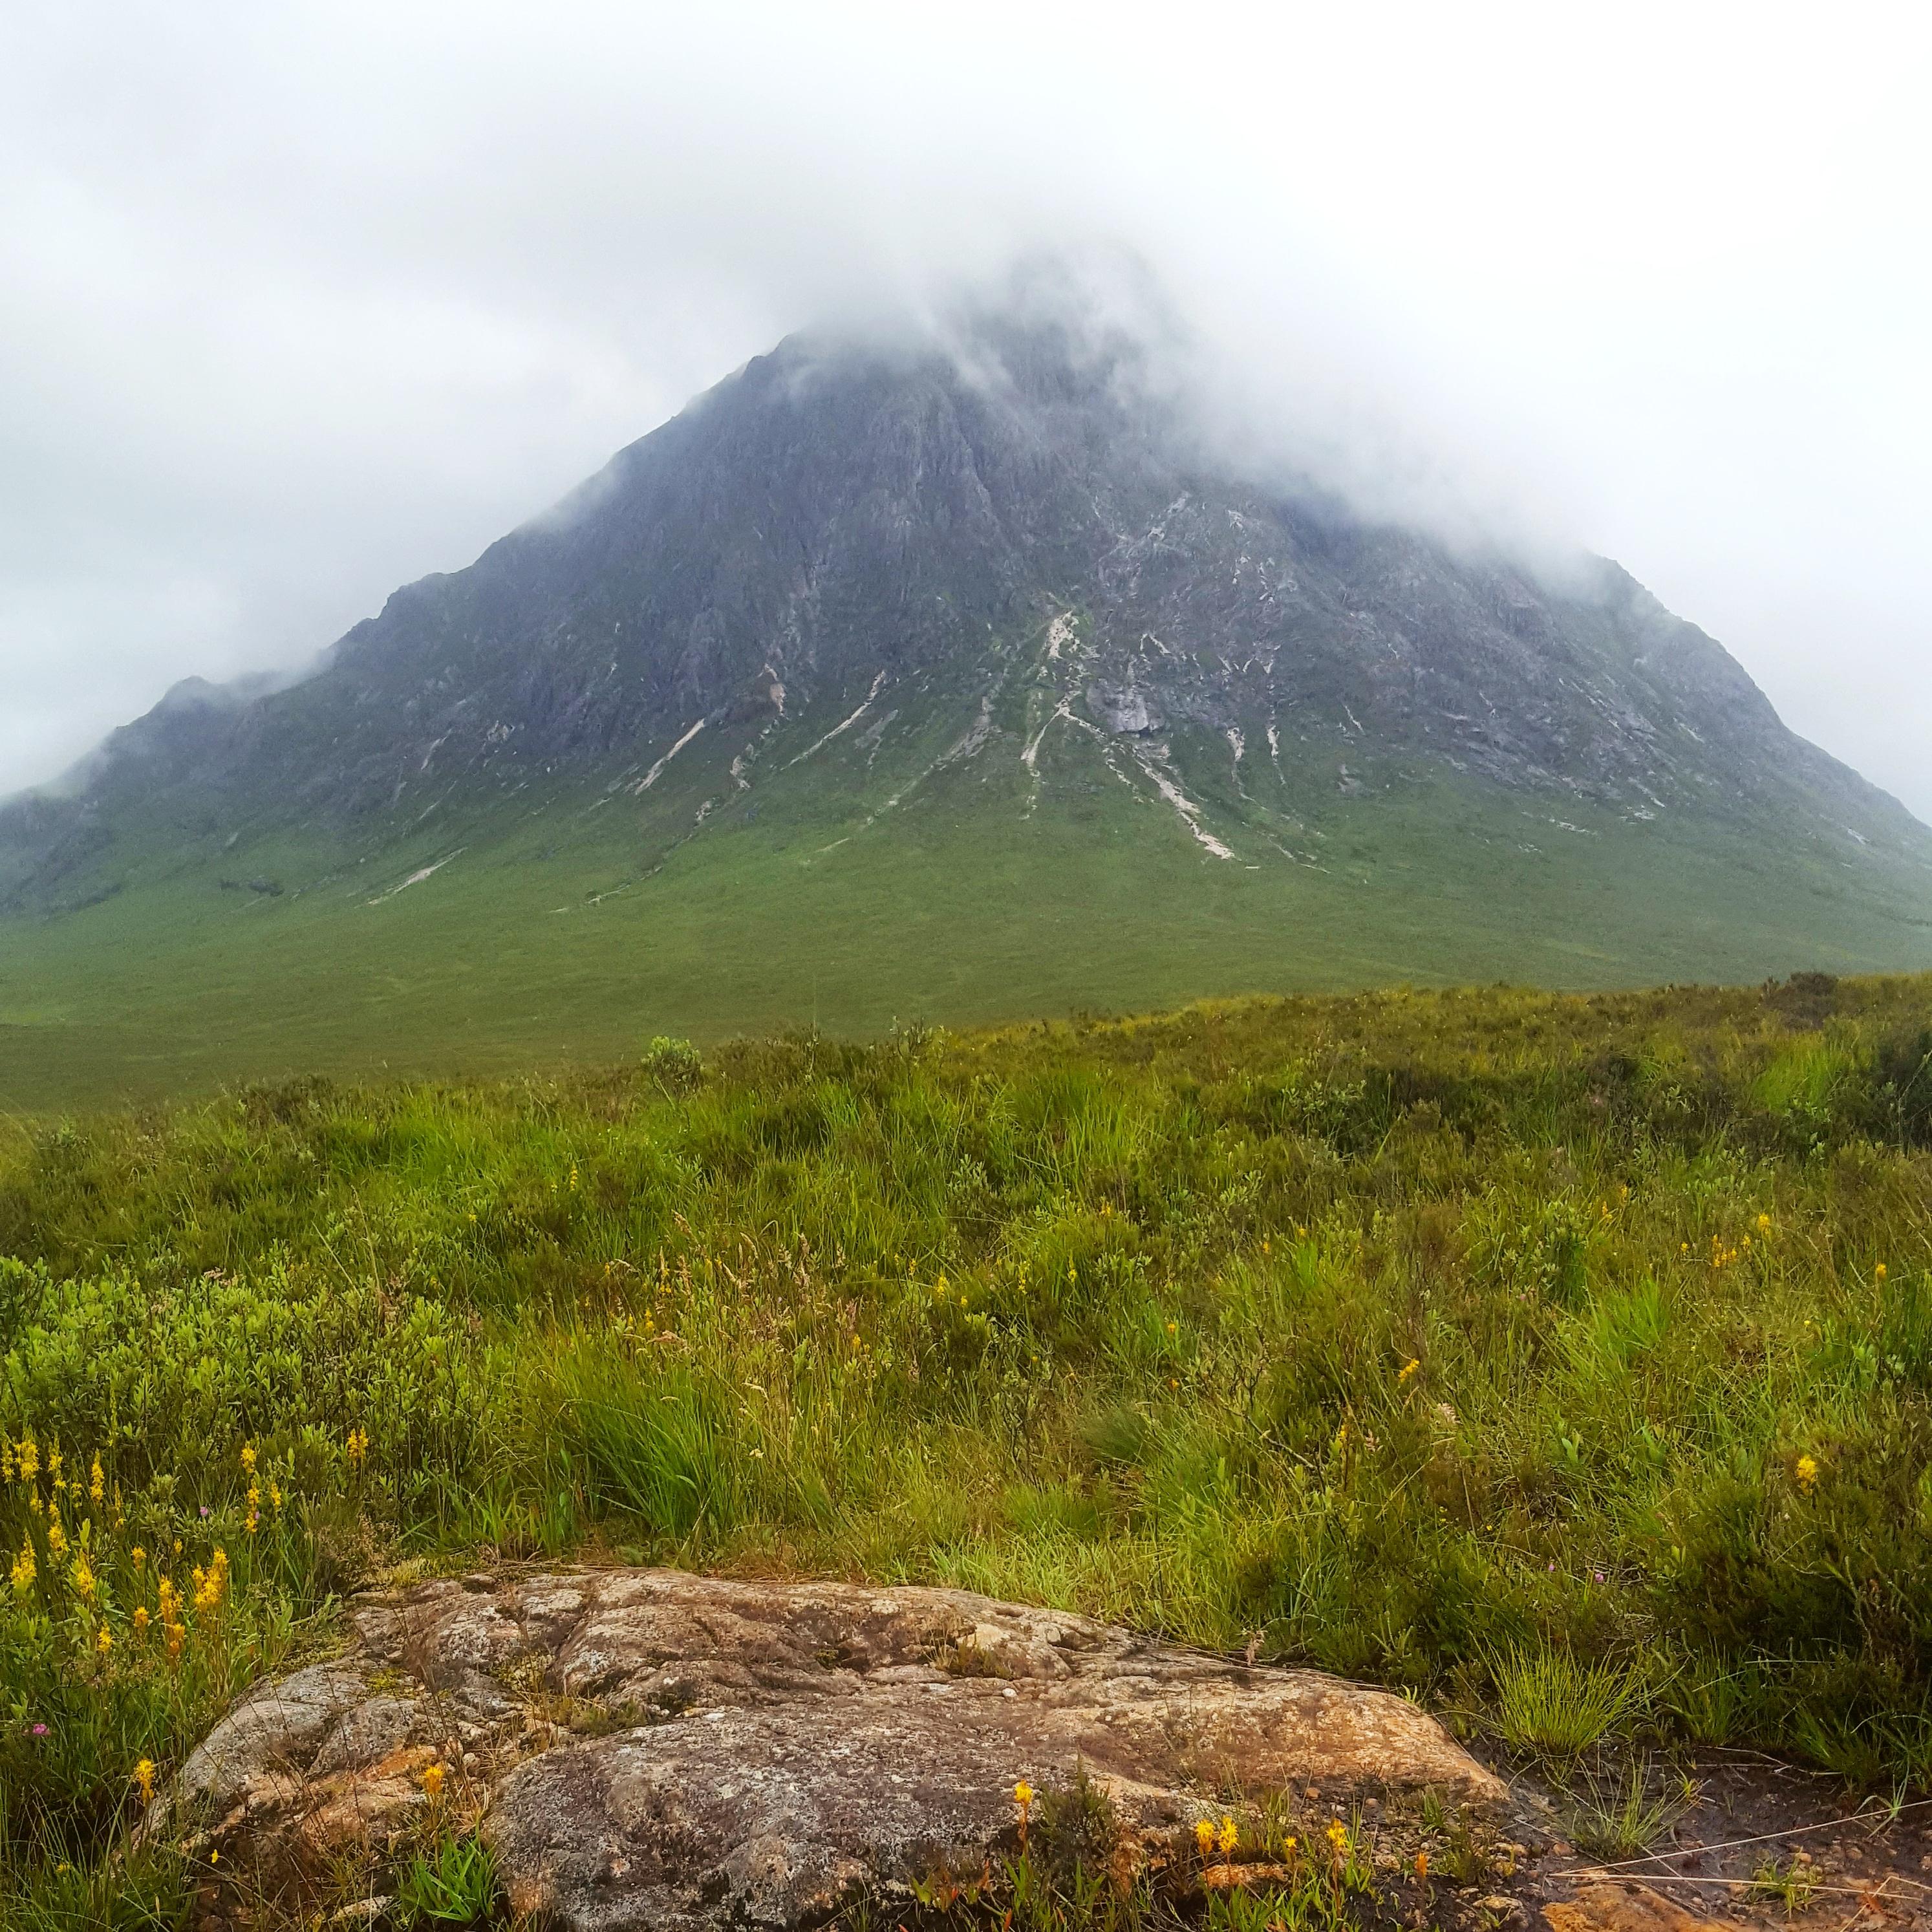 Buachaille Etive Mor in cloud - The Last Krystallos